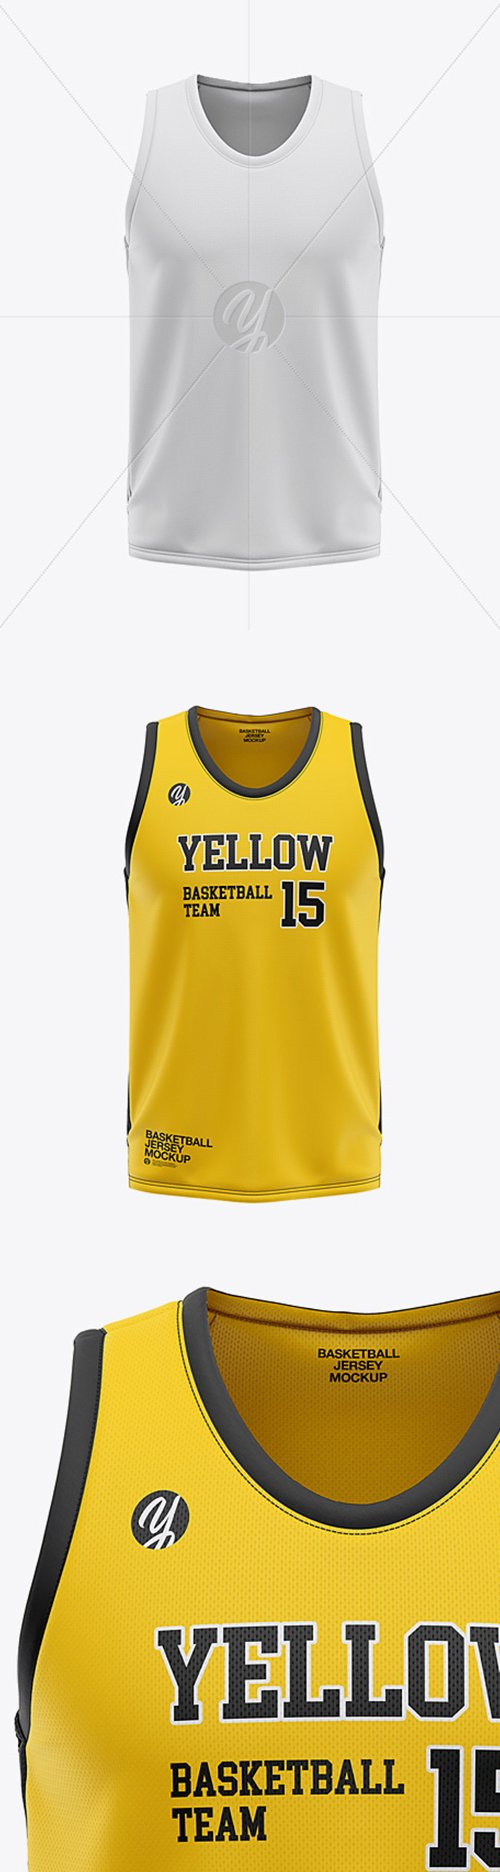 Download Mens U-Neck Basketball Jersey Mockup - Front View 36120 ...